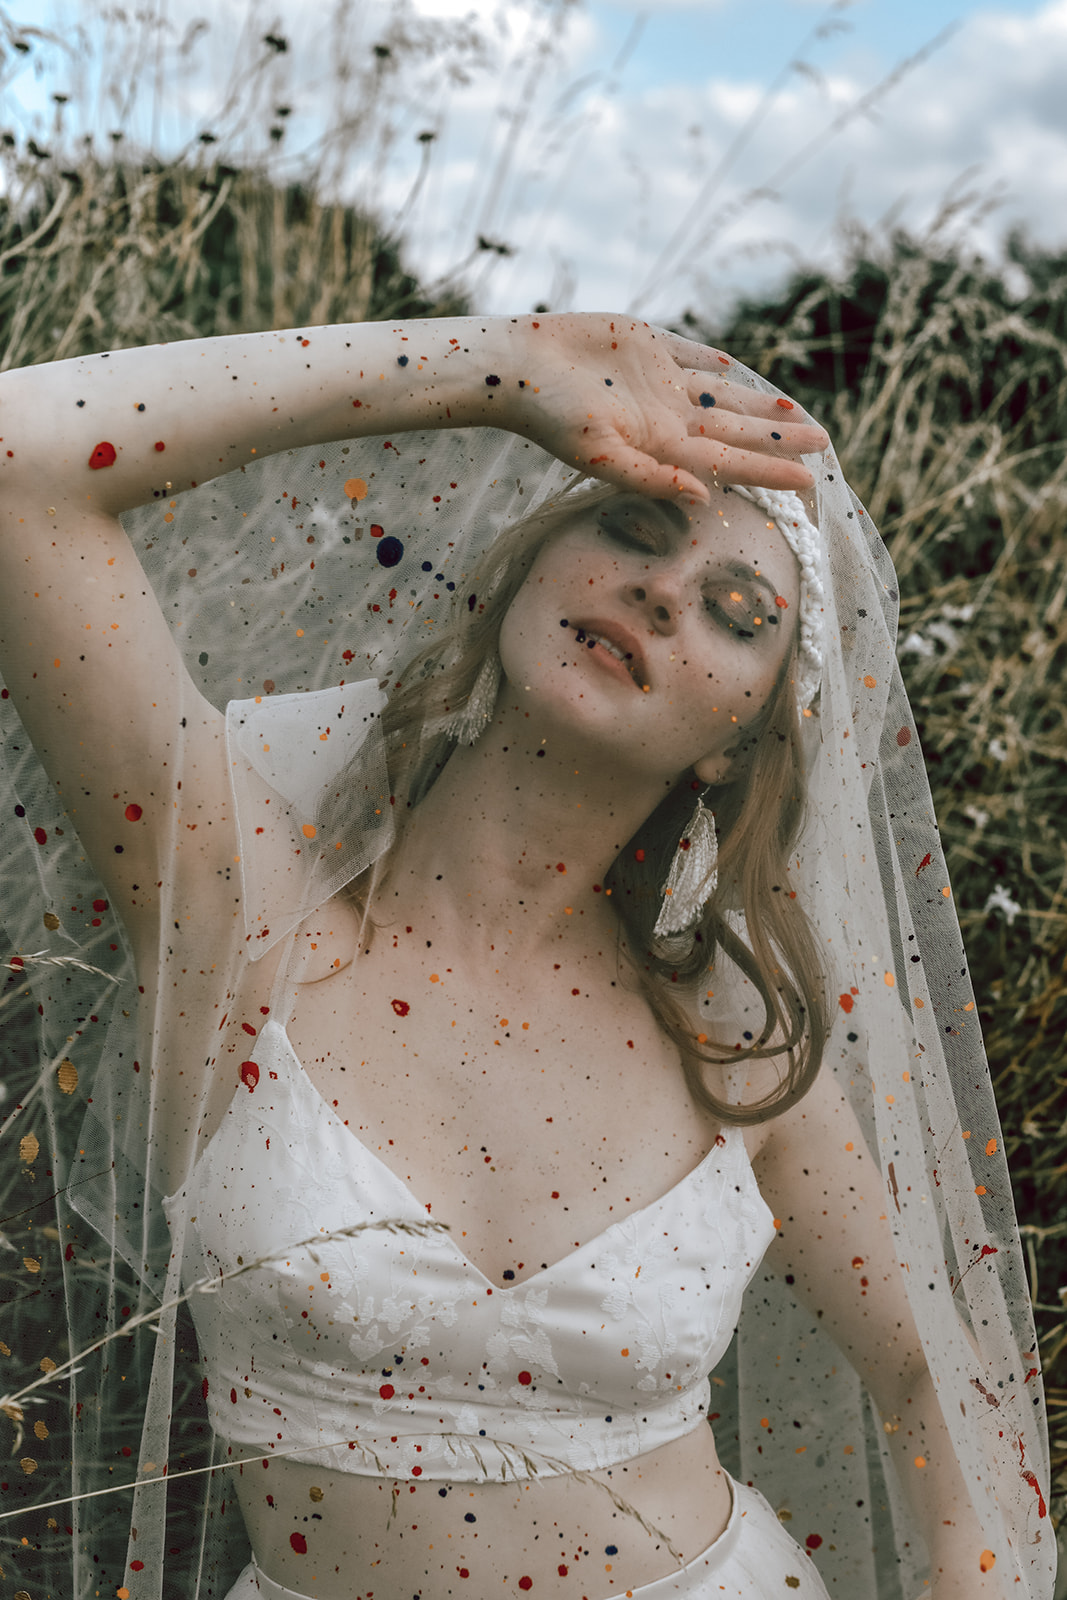 colourful wedding veil - paint splatted wedding veil - hand painted veil - alternative bridalwear - unique bridalwear - unique wedding veil